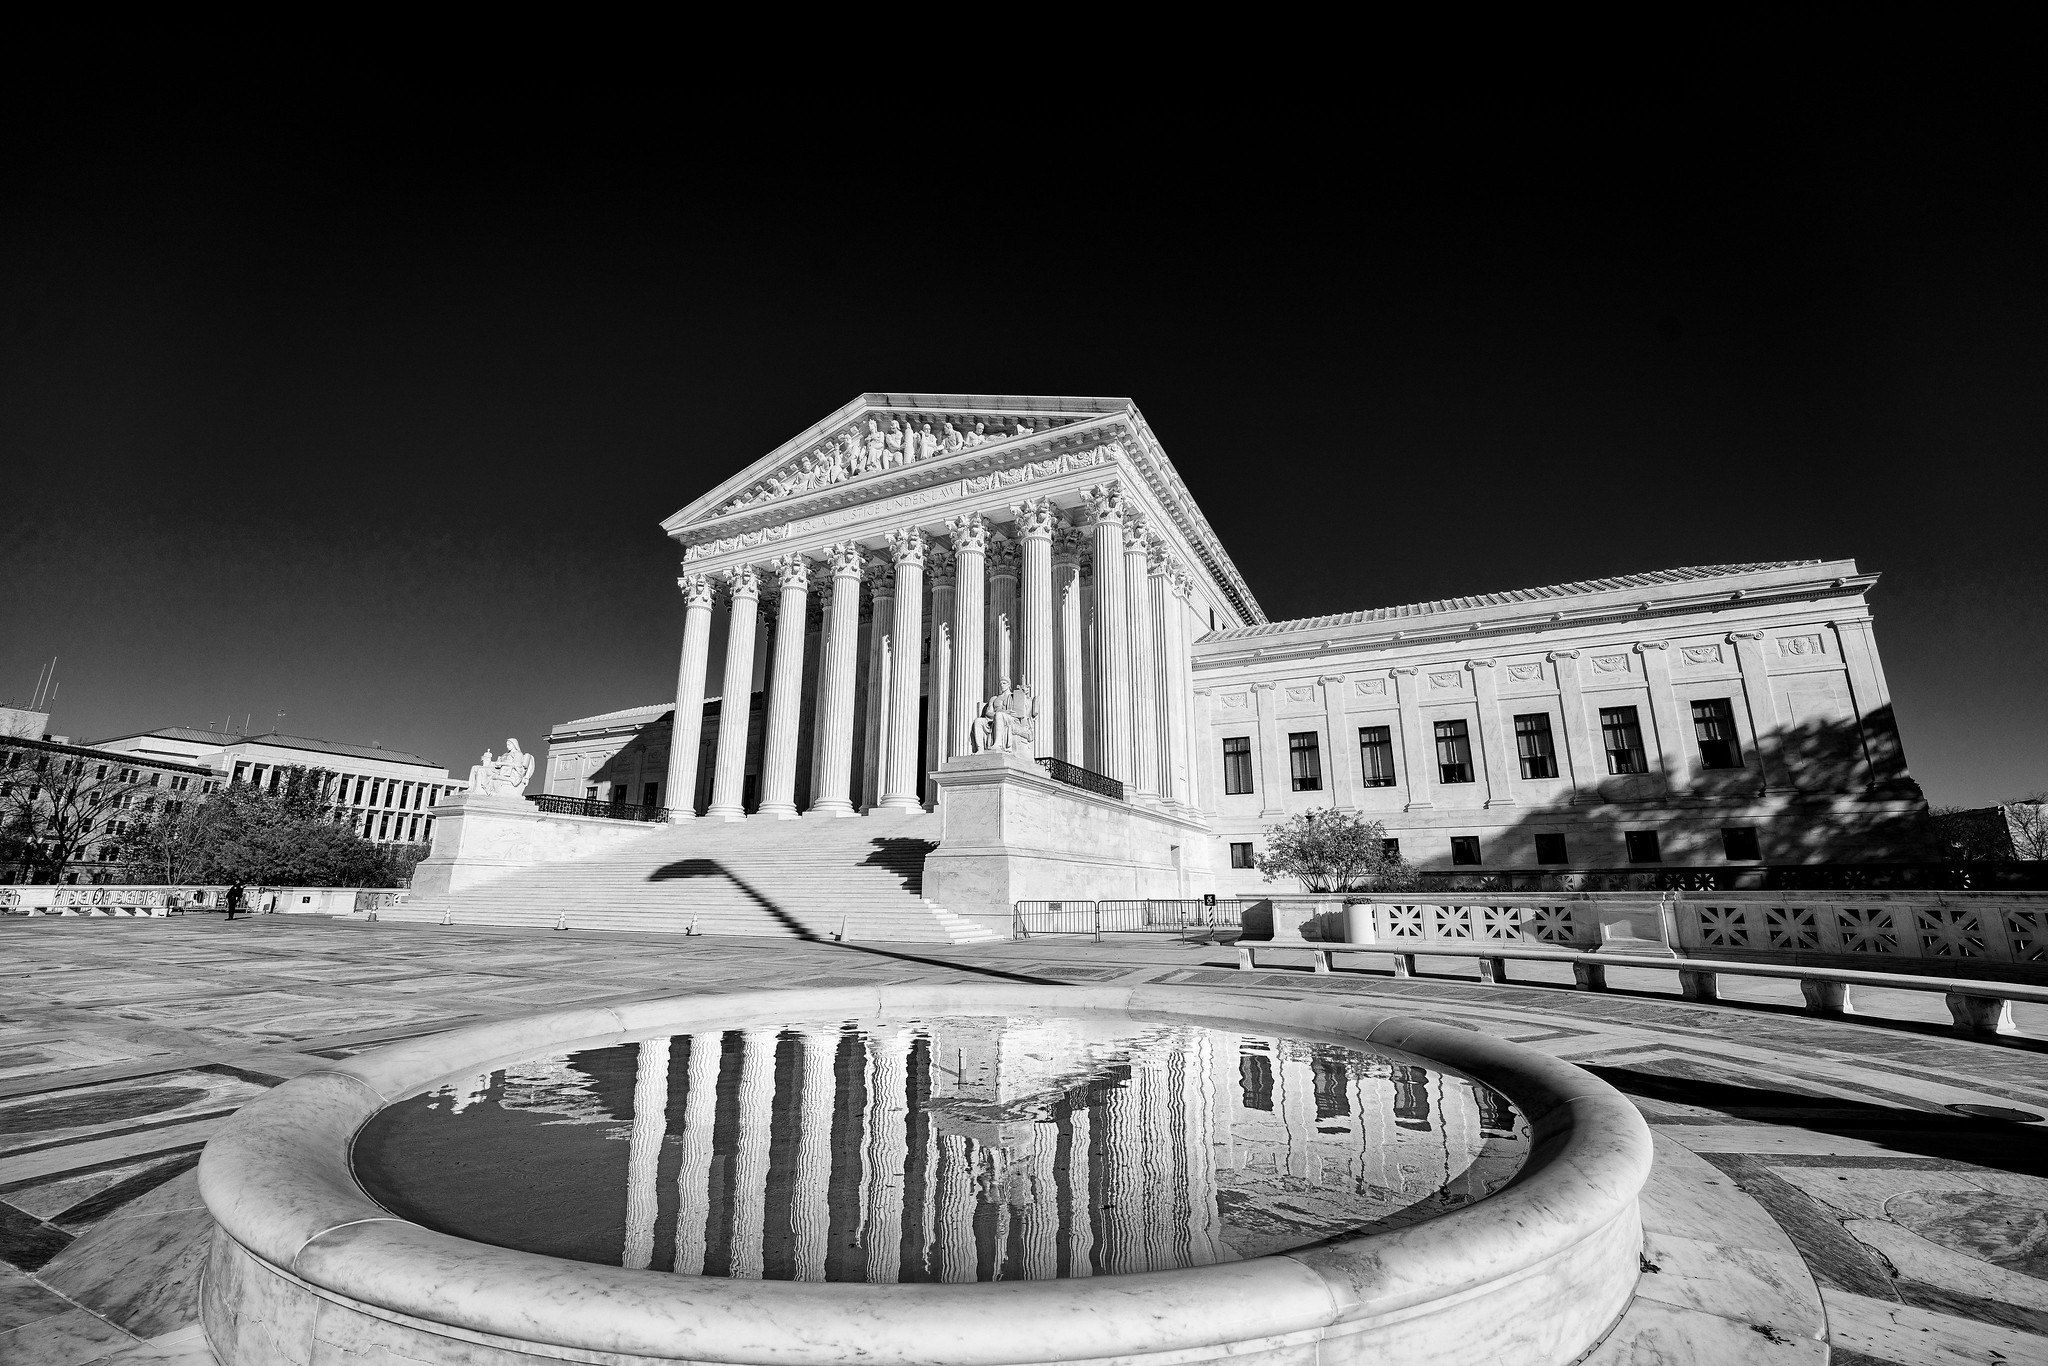 The Supreme Court in Washington, DC., seen on Nov. 20, 2020. (Miki Jourdan/Flickr Commons)